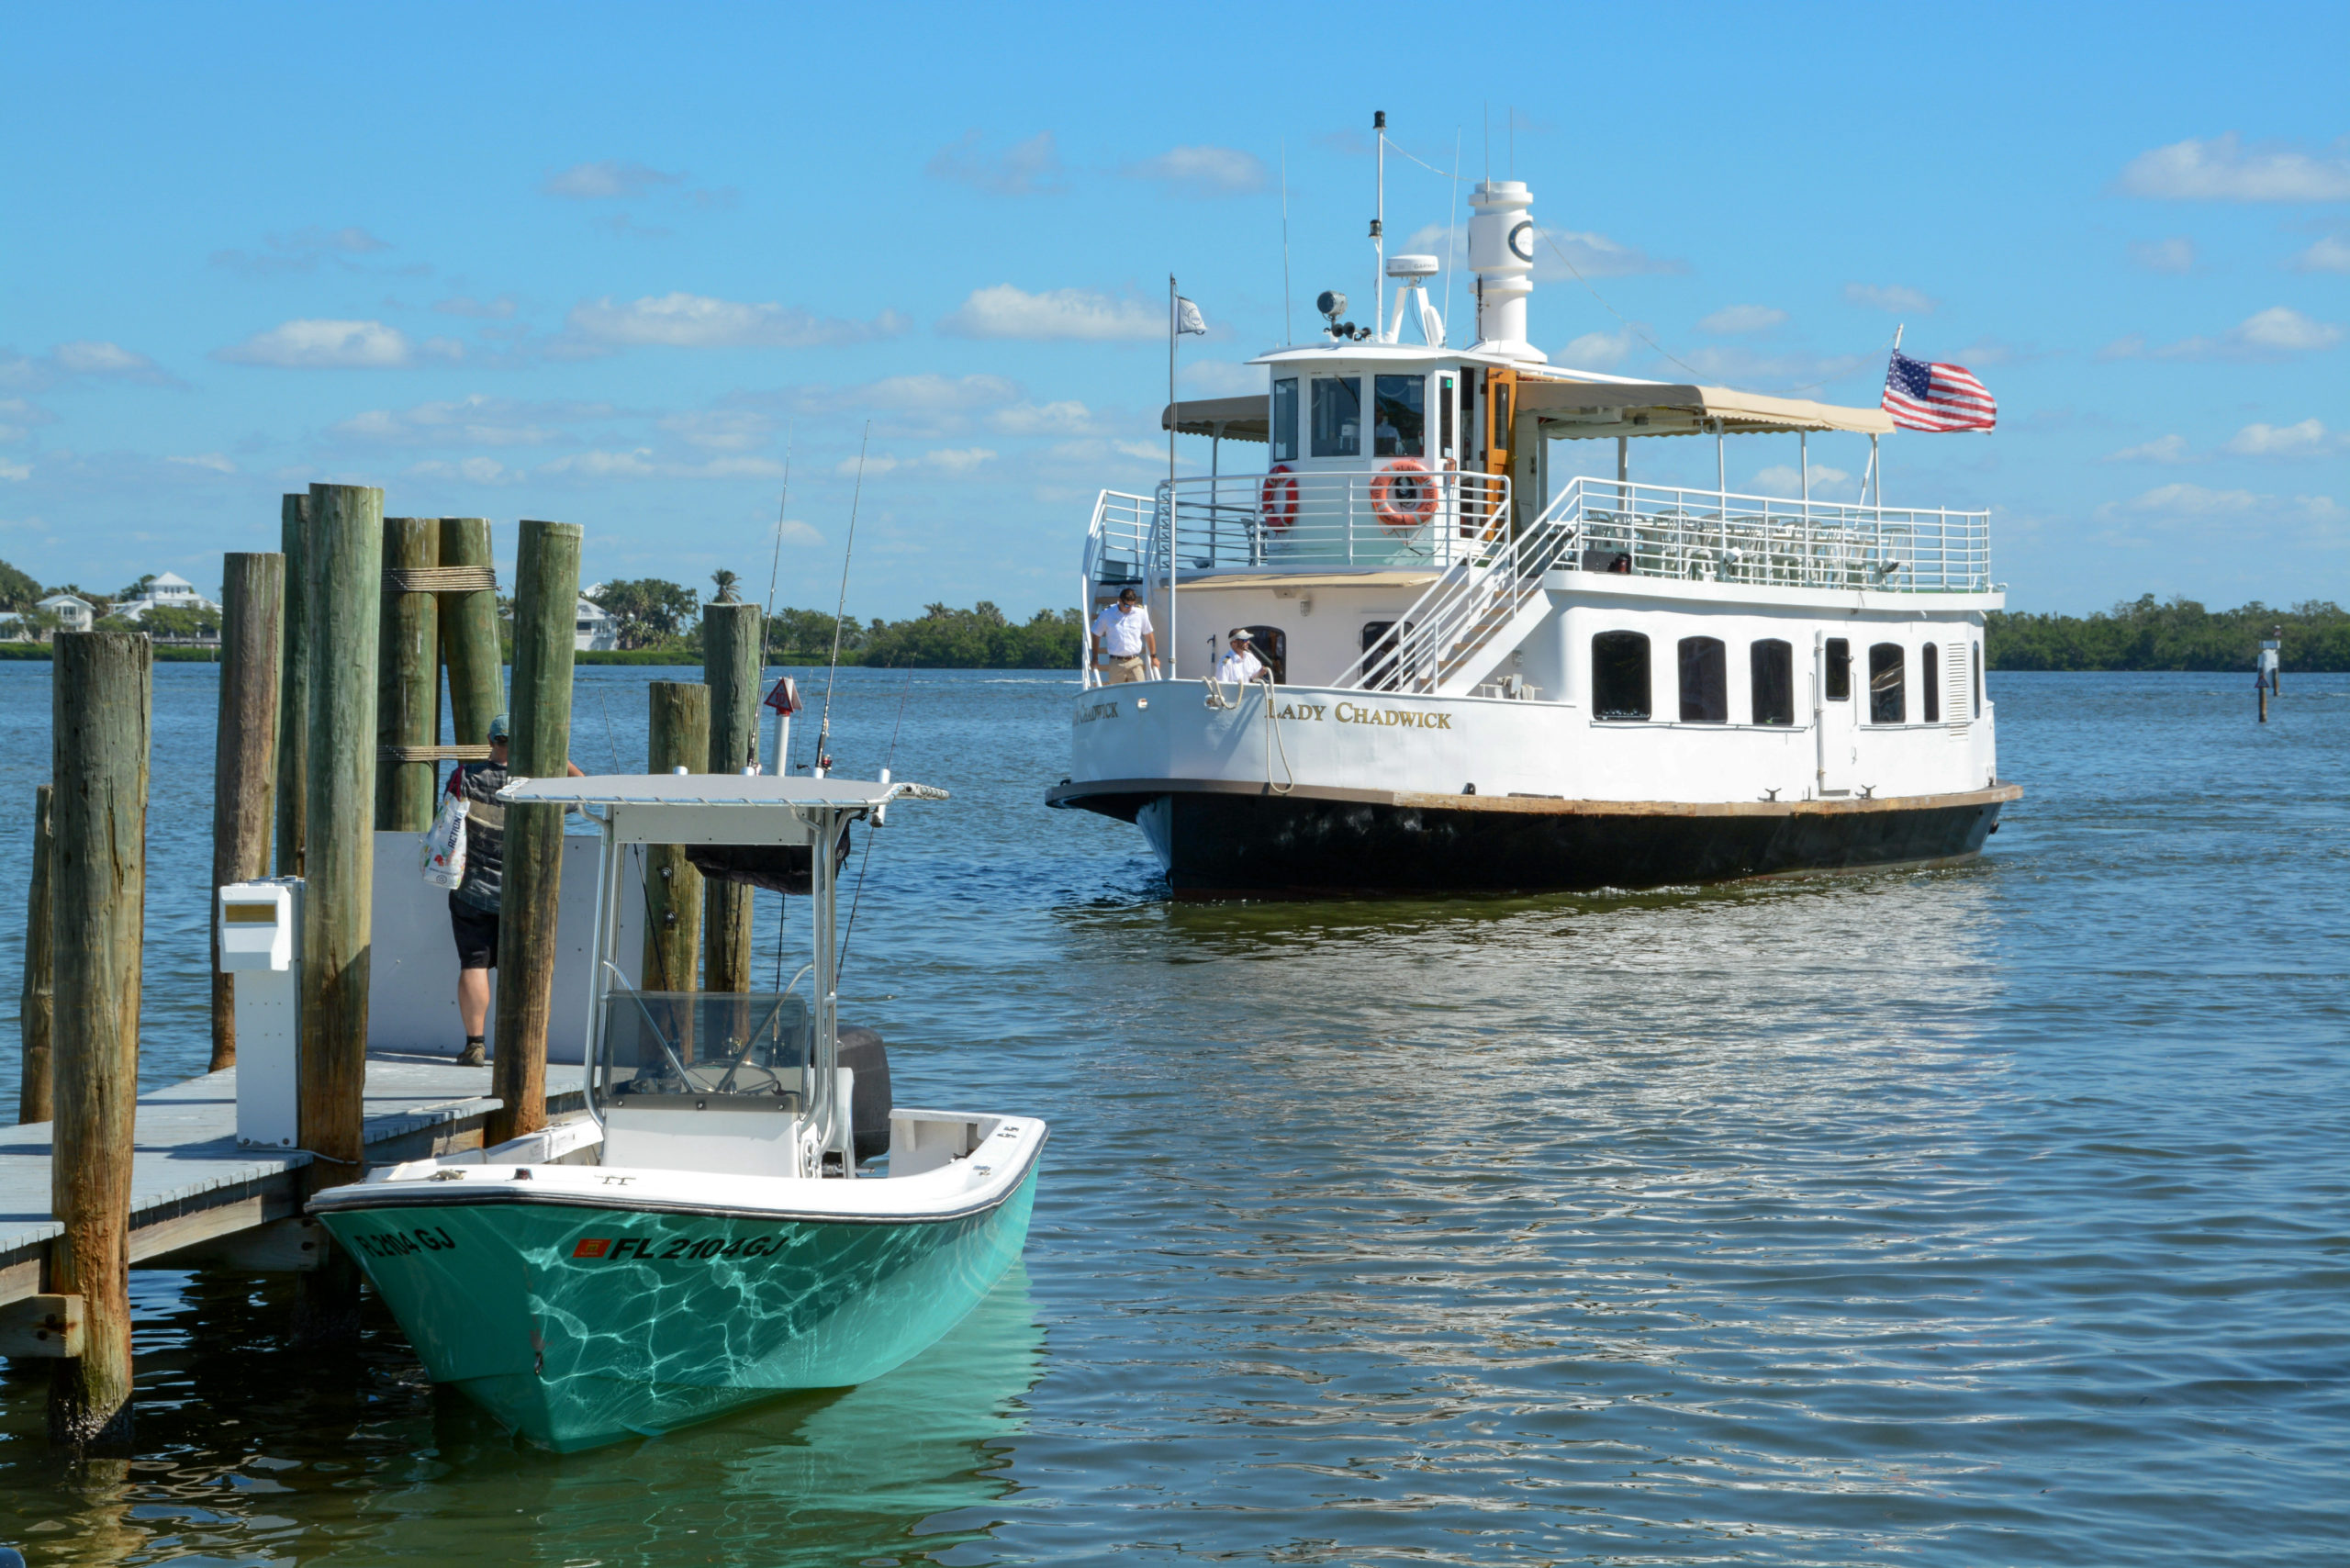 Die Lady Chadwick von Captiva Cruises legt an